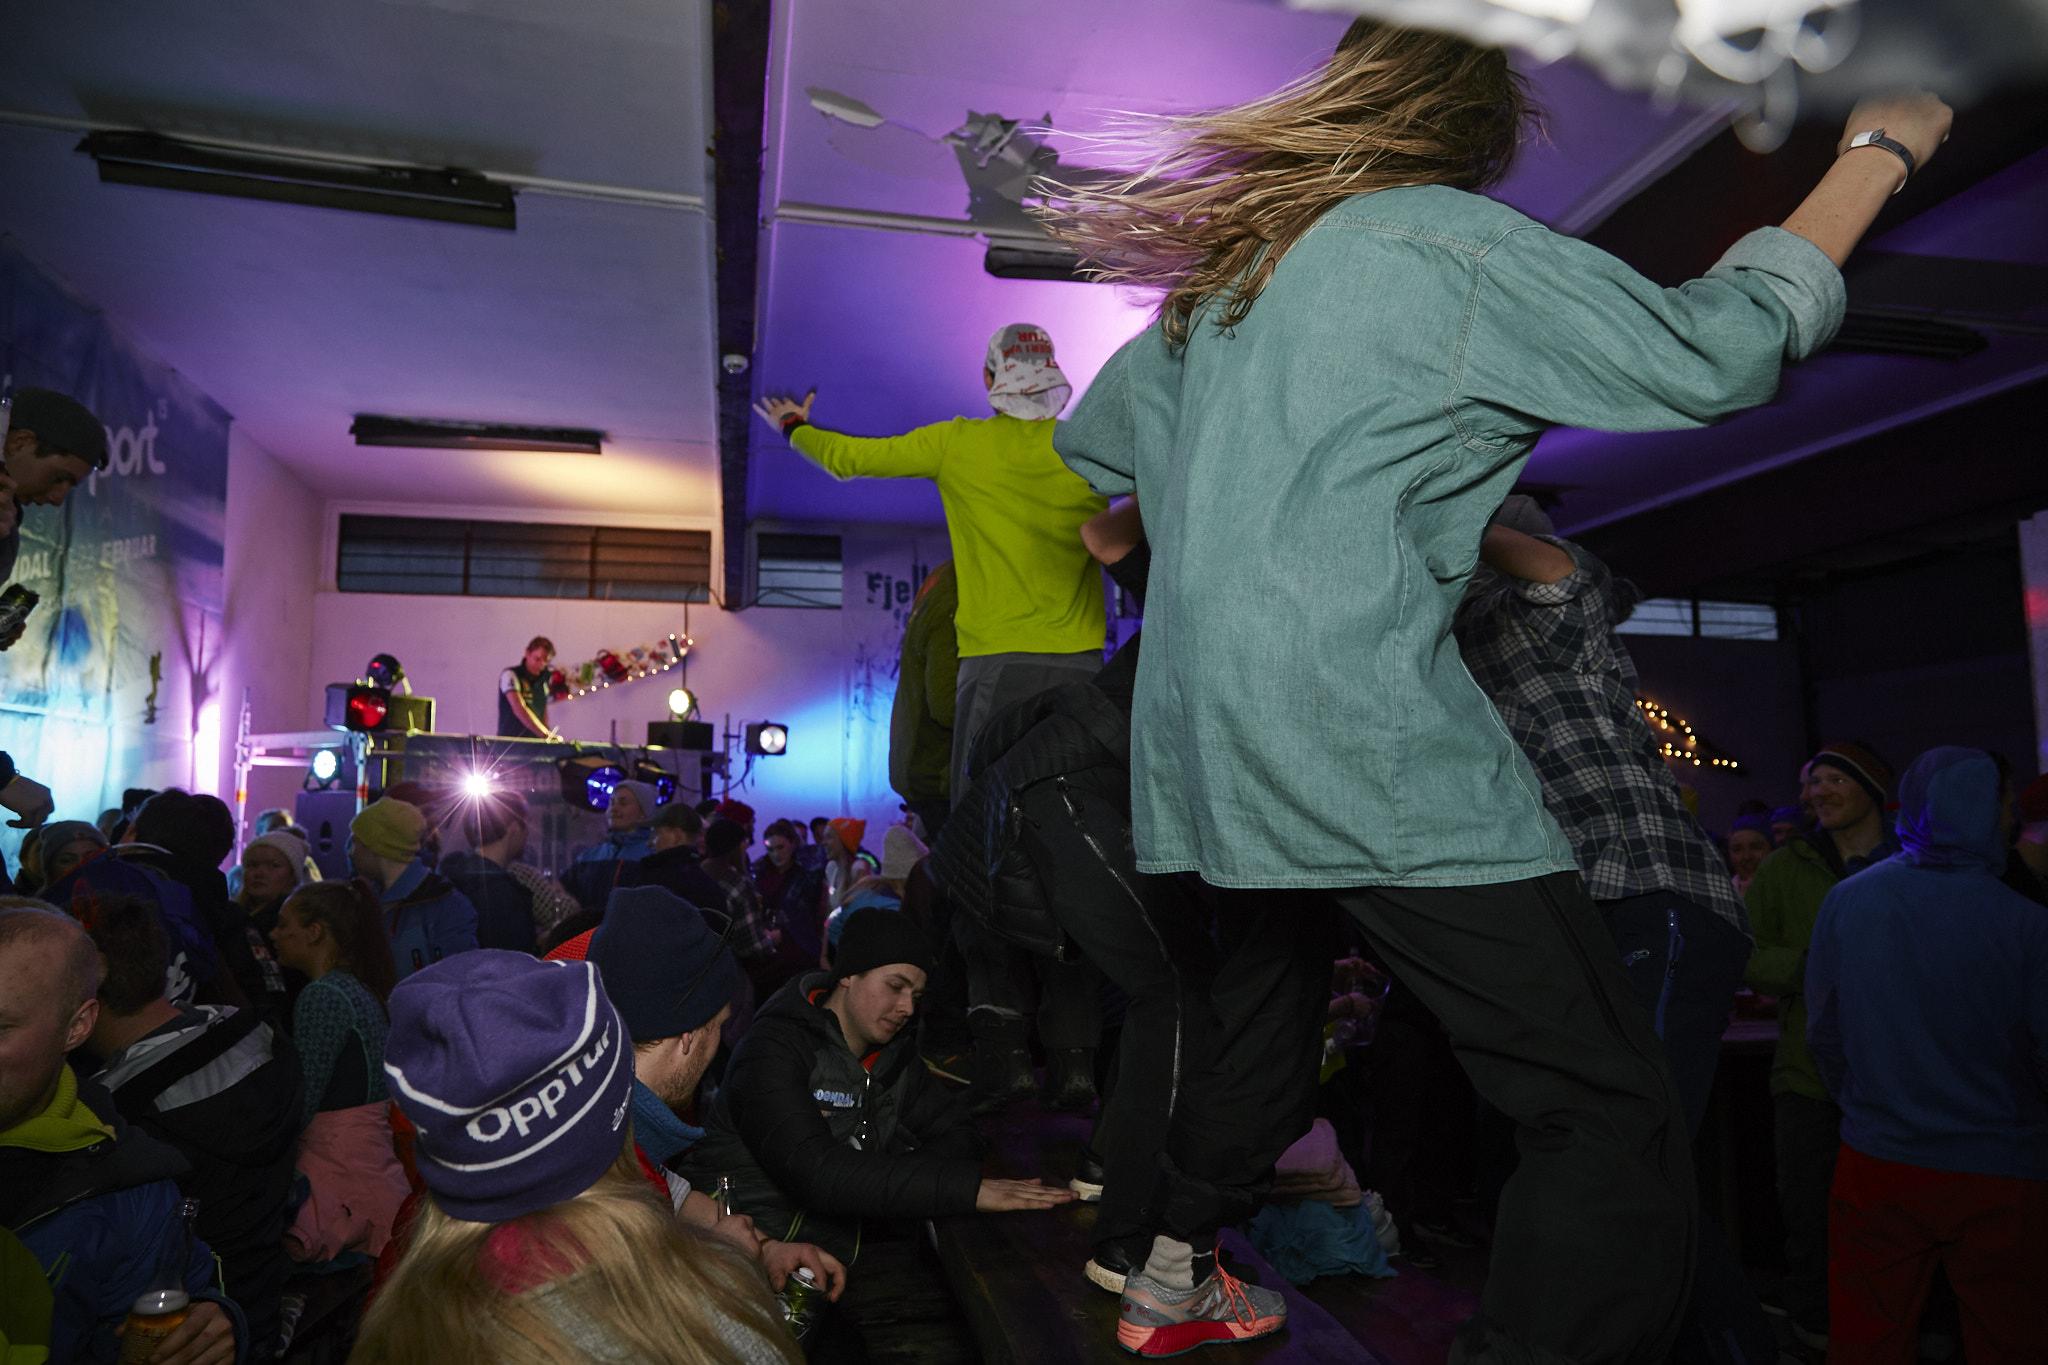 2018.02.22-Fjellsportfestival-Afterski-012.jpg